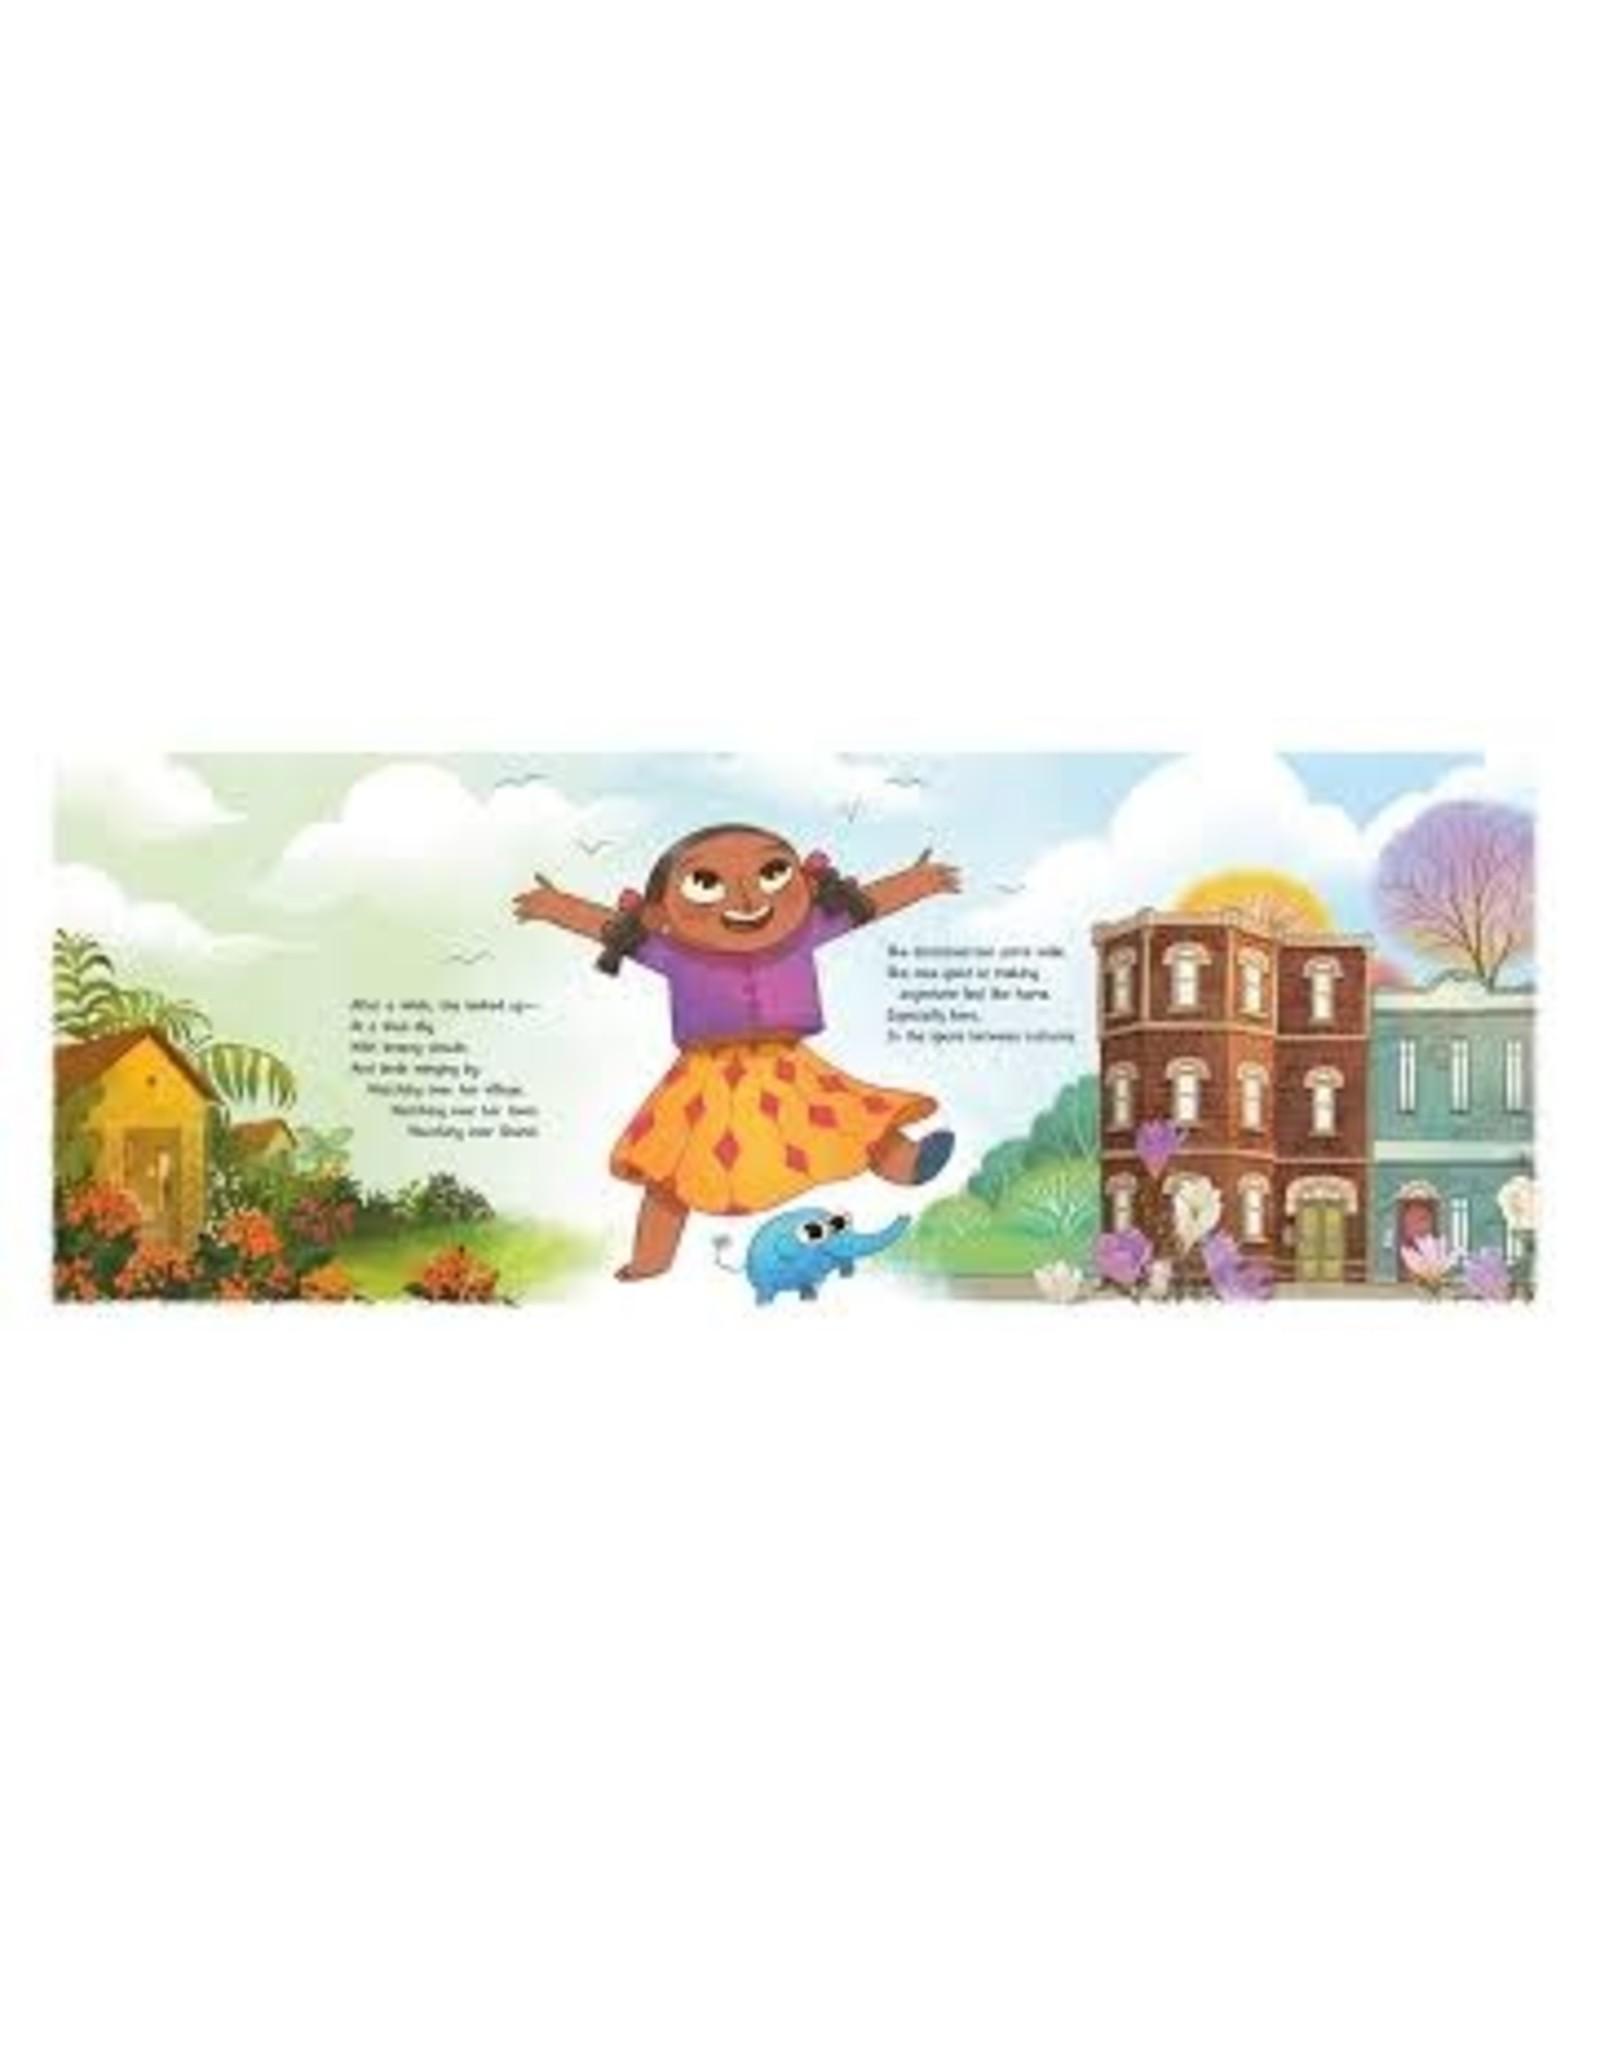 Books Home is in Between by Mitali Perkins Illustrated by Lavanya Naidu